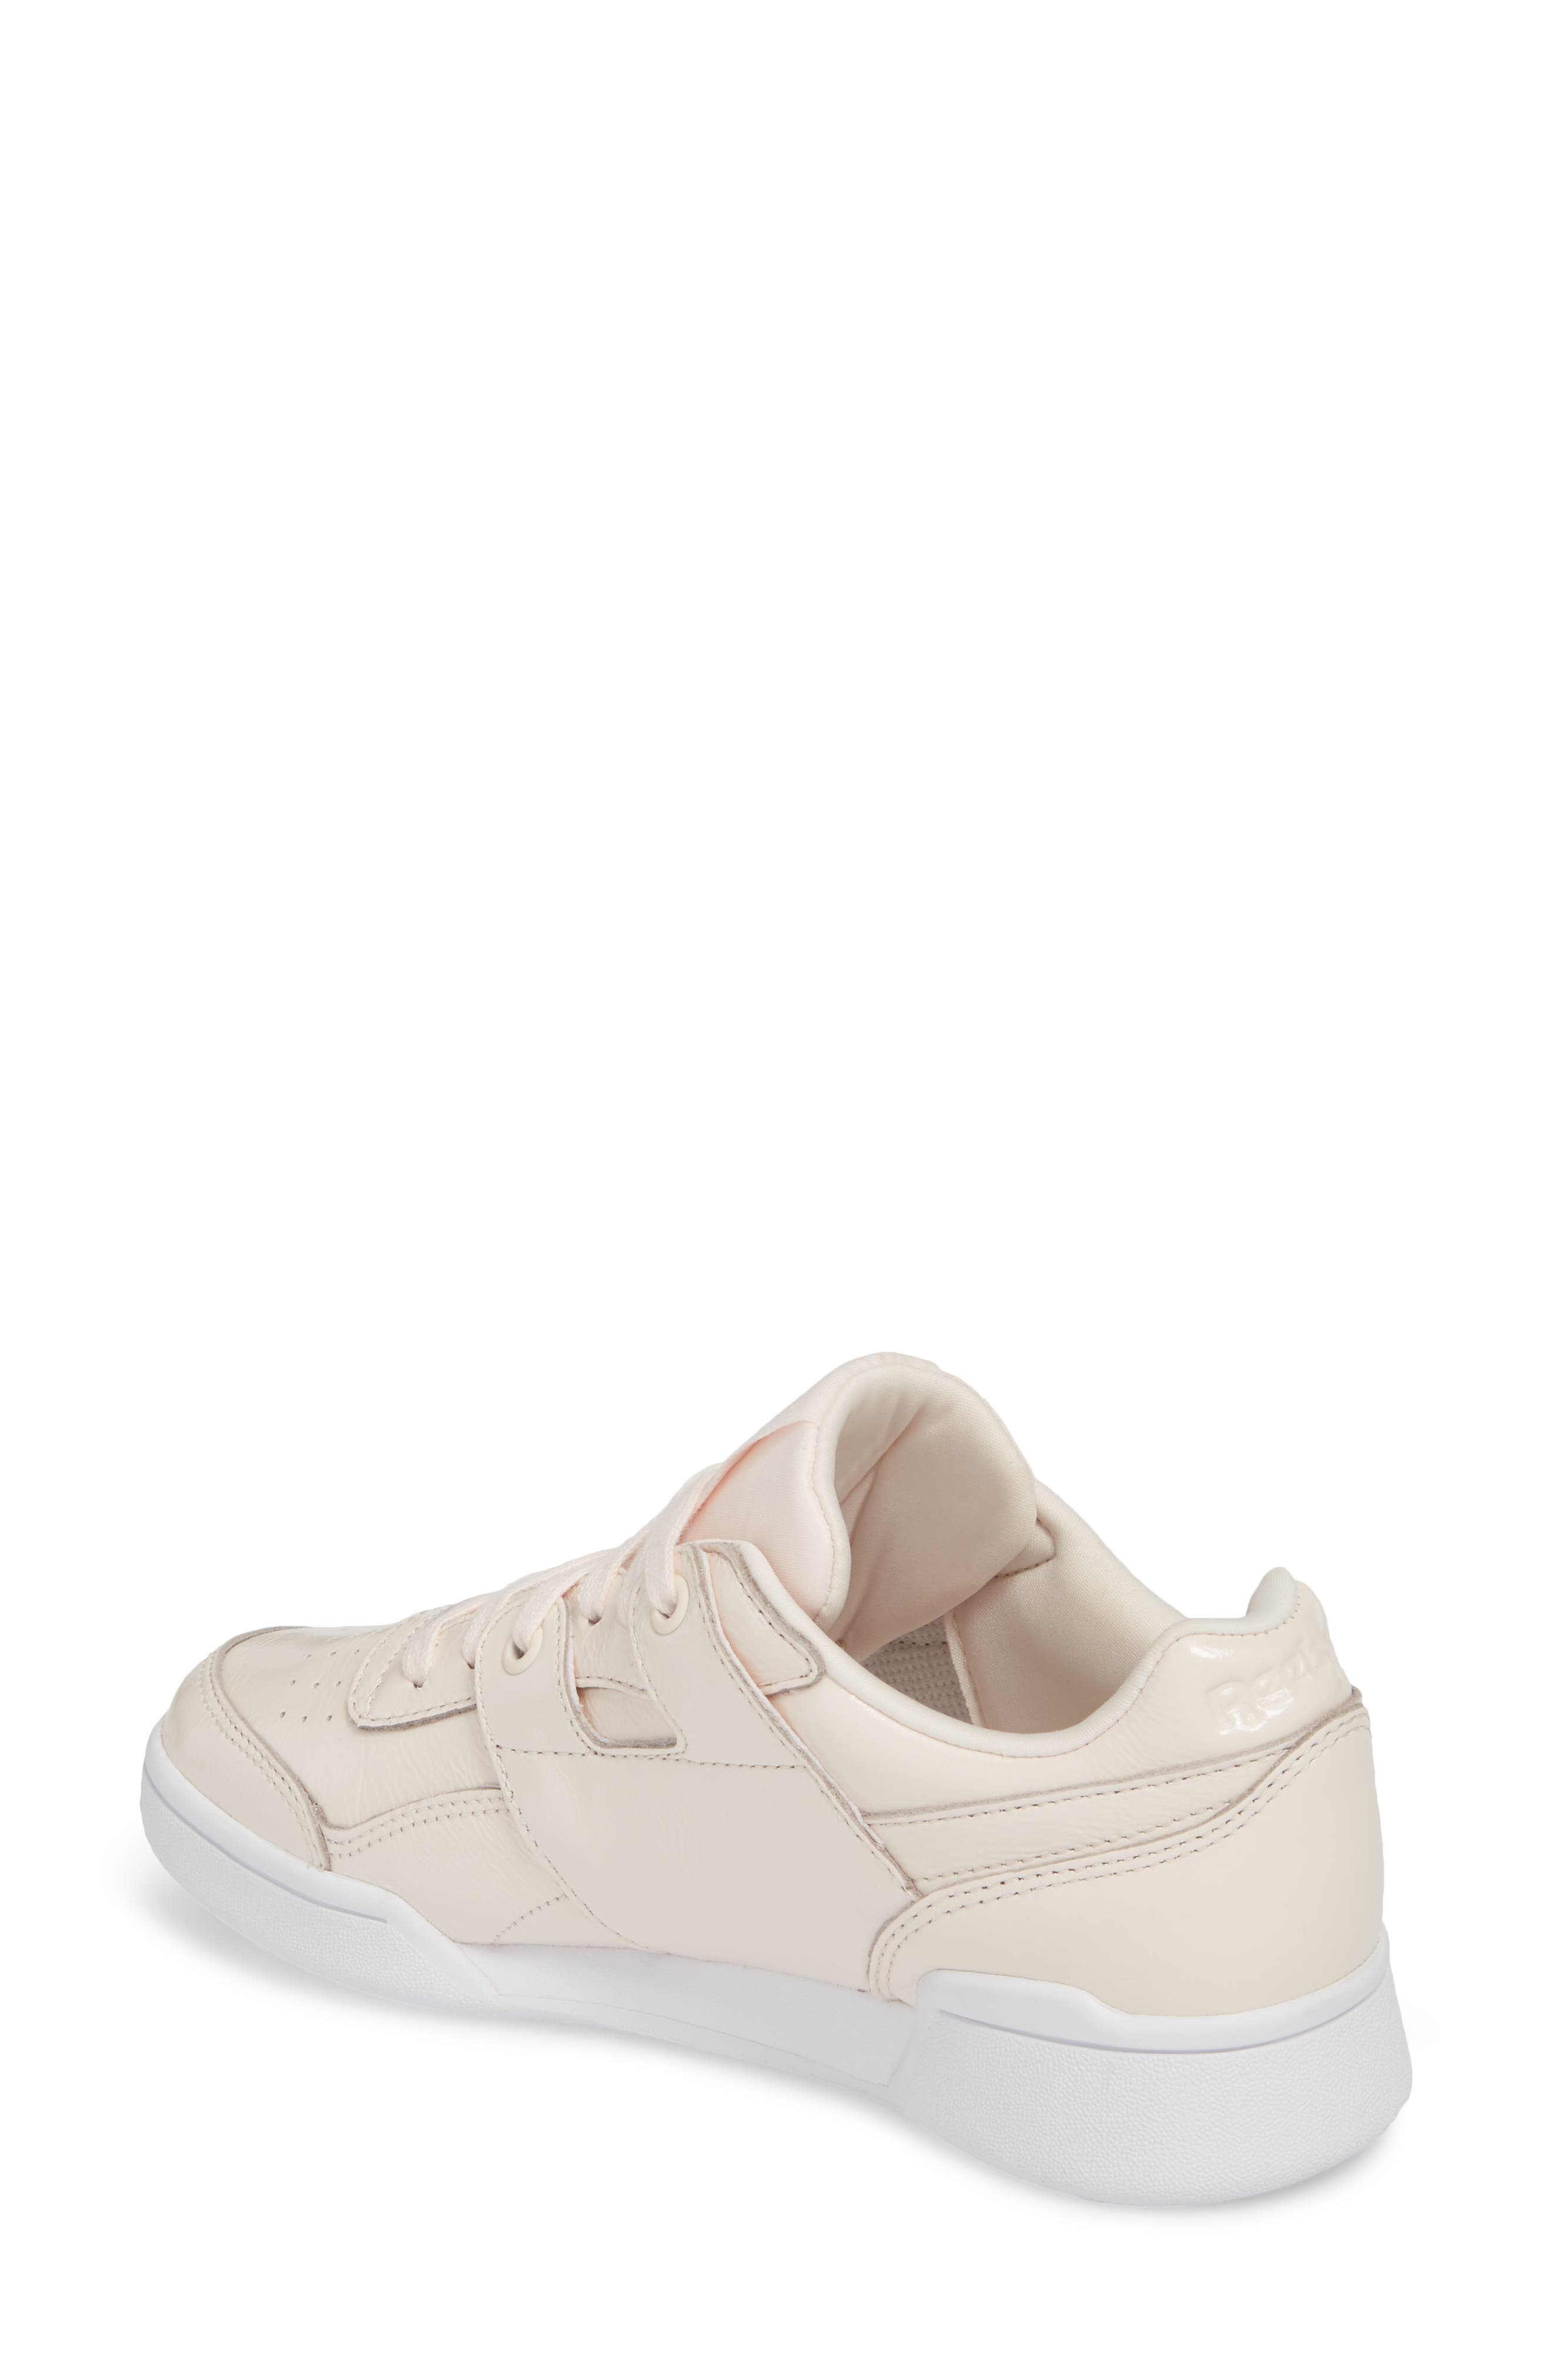 Workout Lo Plus Iridescent Sneaker,                             Alternate thumbnail 2, color,                             650